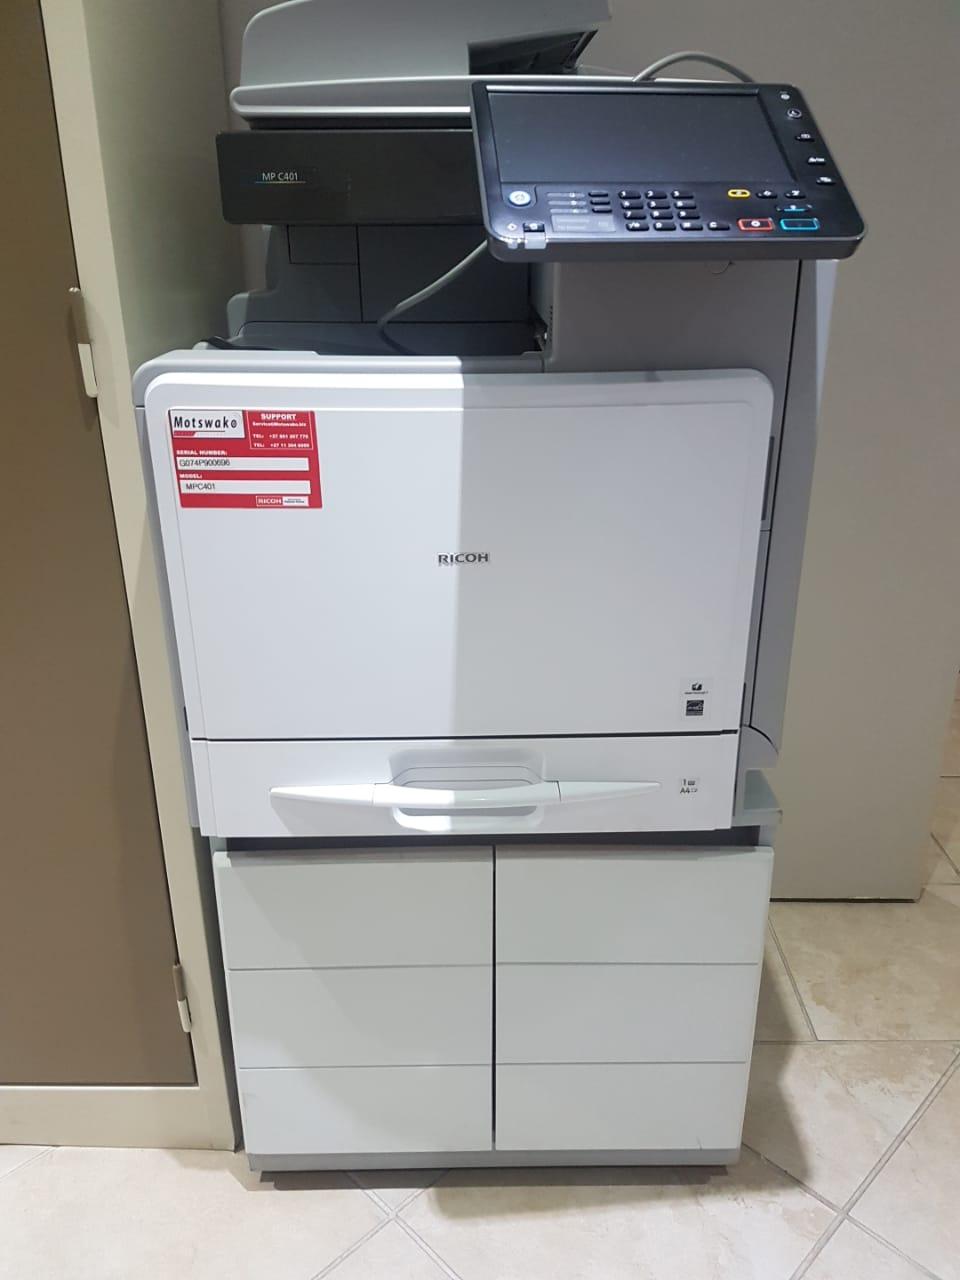 RICOH MP C401 Printer